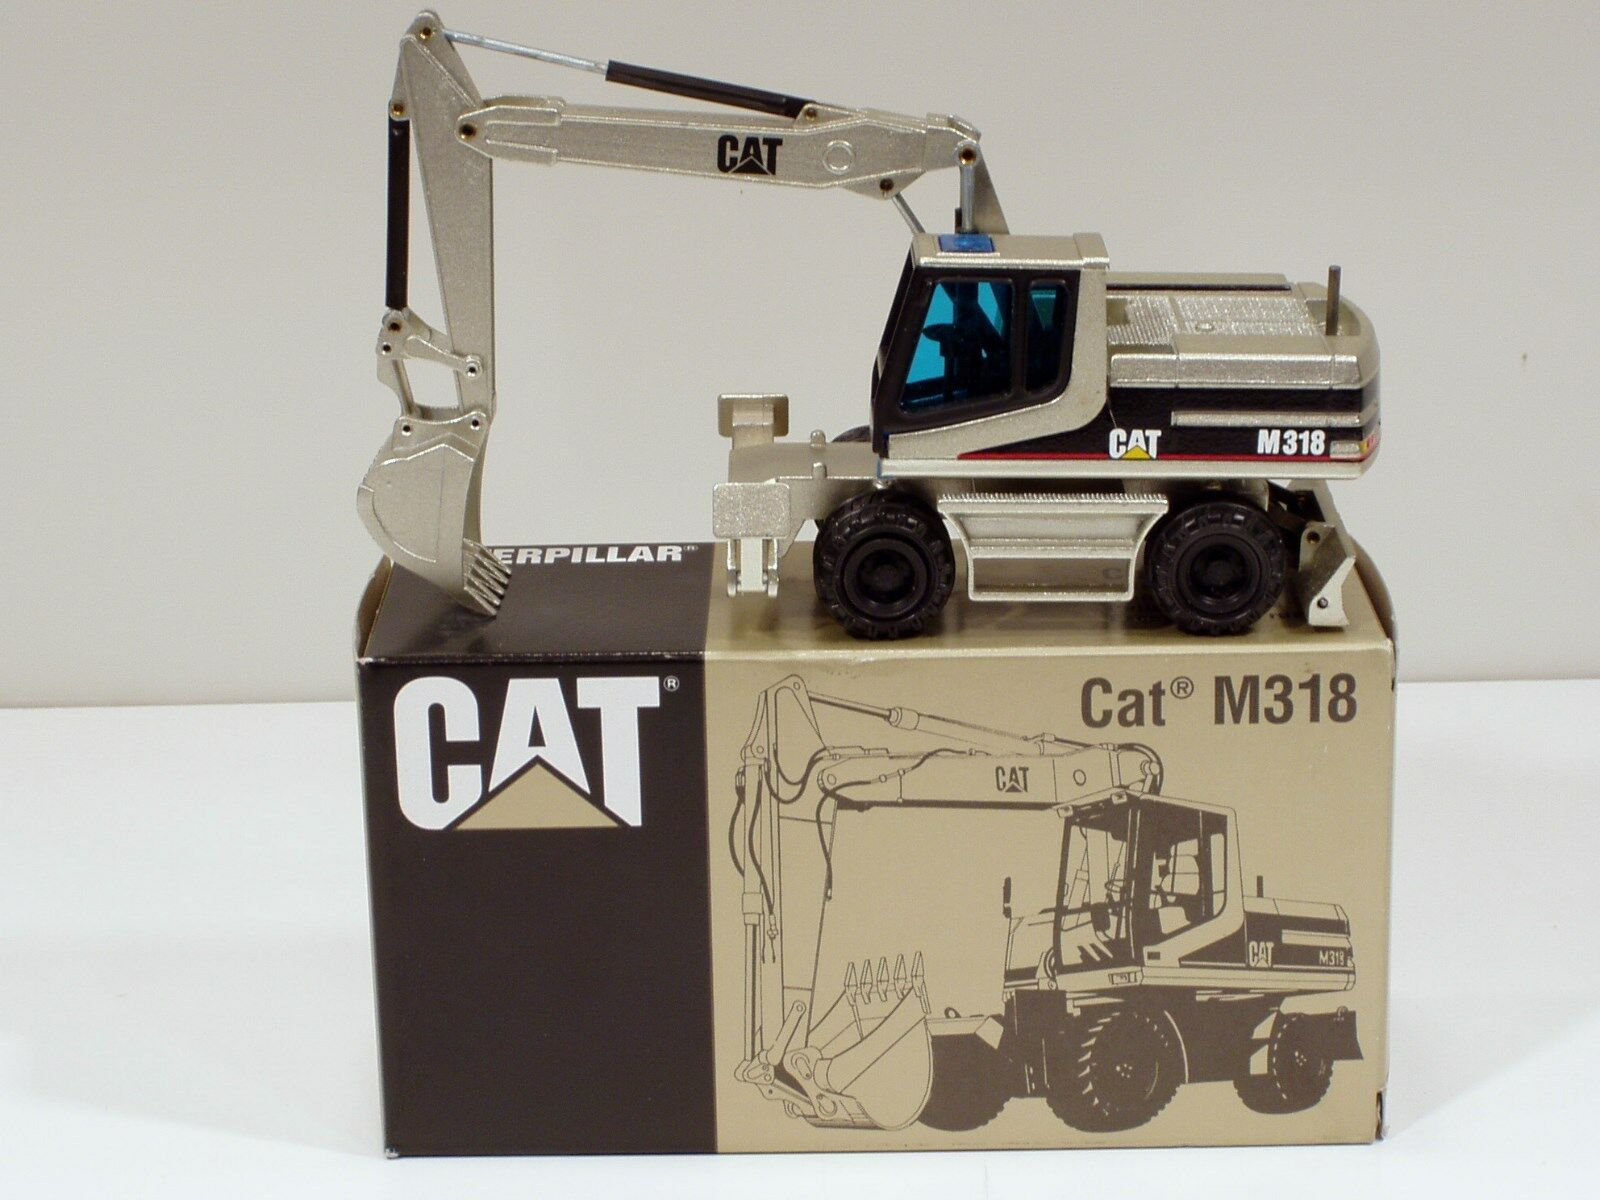 Caterpillar M318 Wheel Excavator -  PALE oro  - 1 50 - NZG  405.02 - MIB